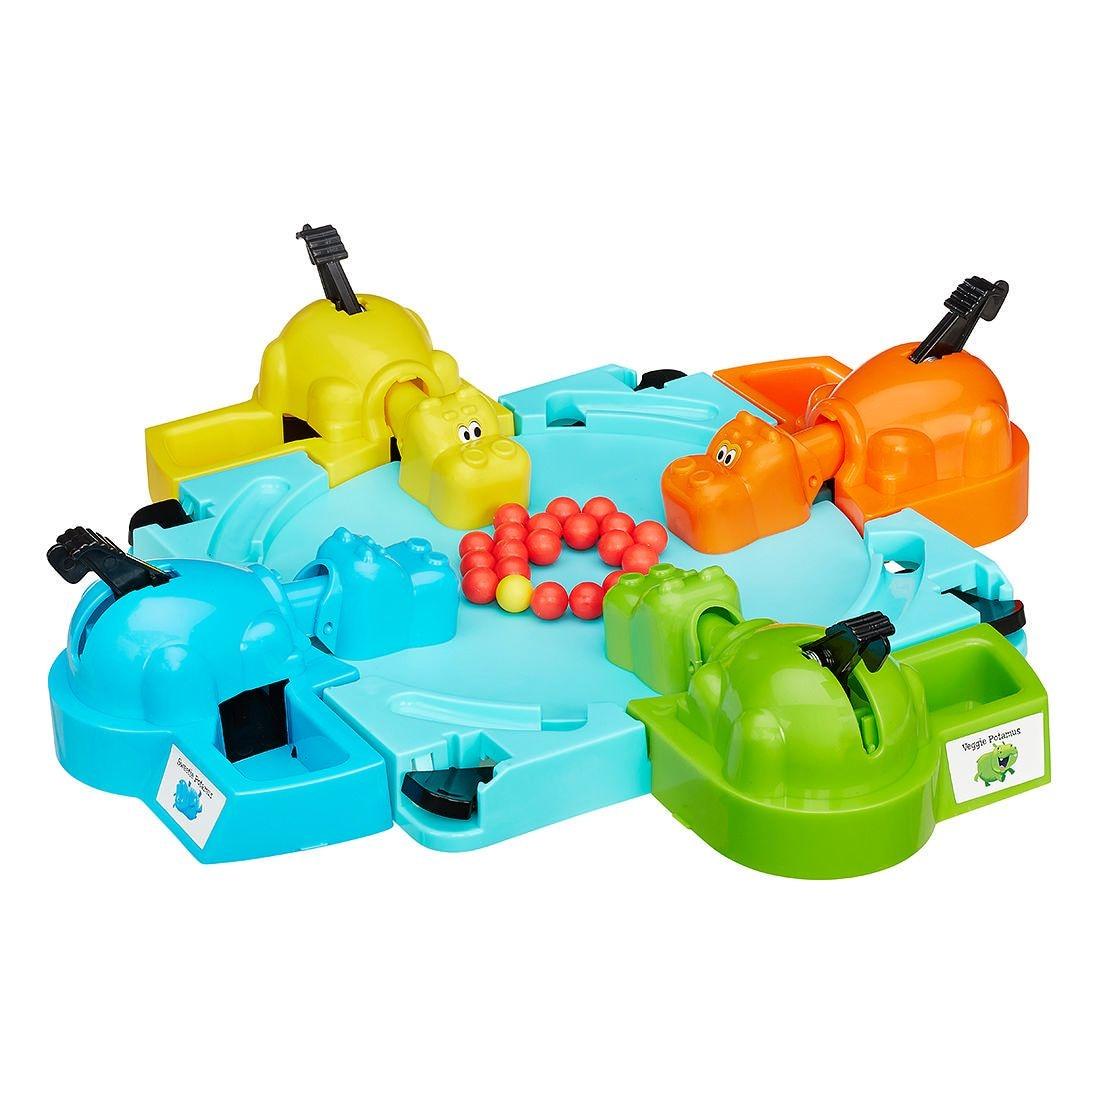 Hungry Hungry Hippos Game | Target Australia